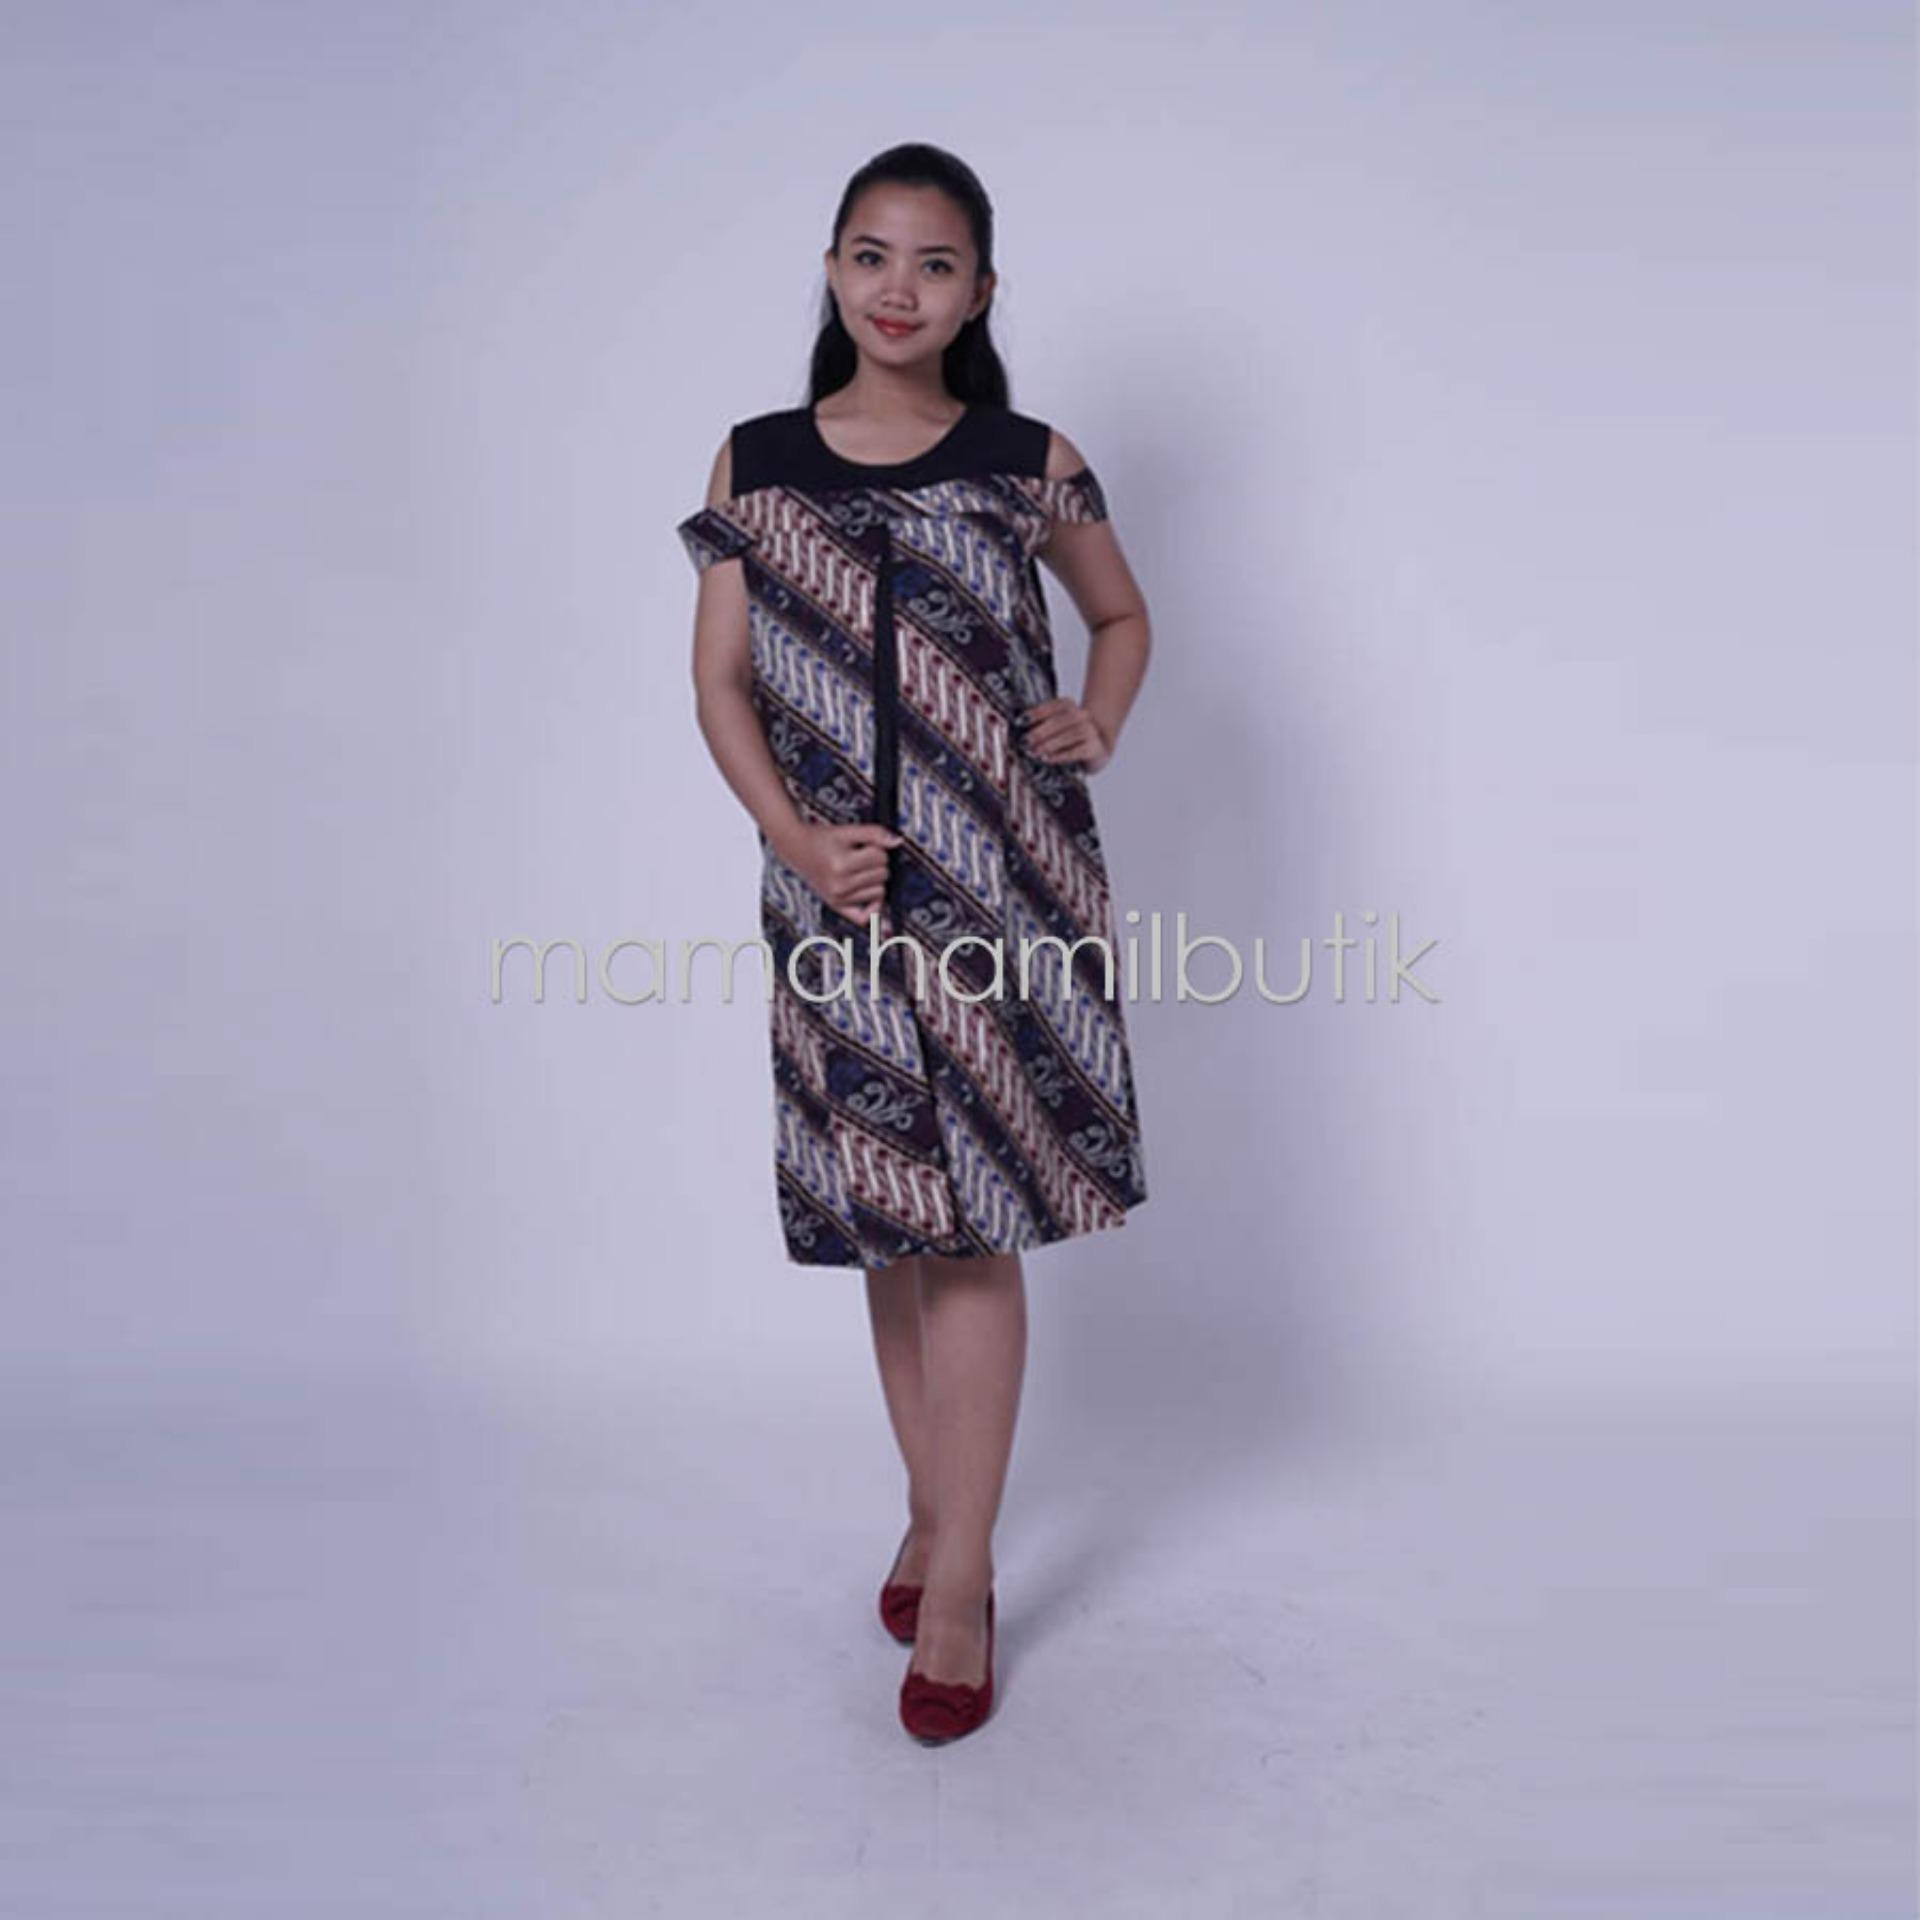 Mama Hamil FREE CD Hamil 1psc Baju Hamil Dress Menyusui Bolero Batik Etnik Sabrina Cantik - DRO 809